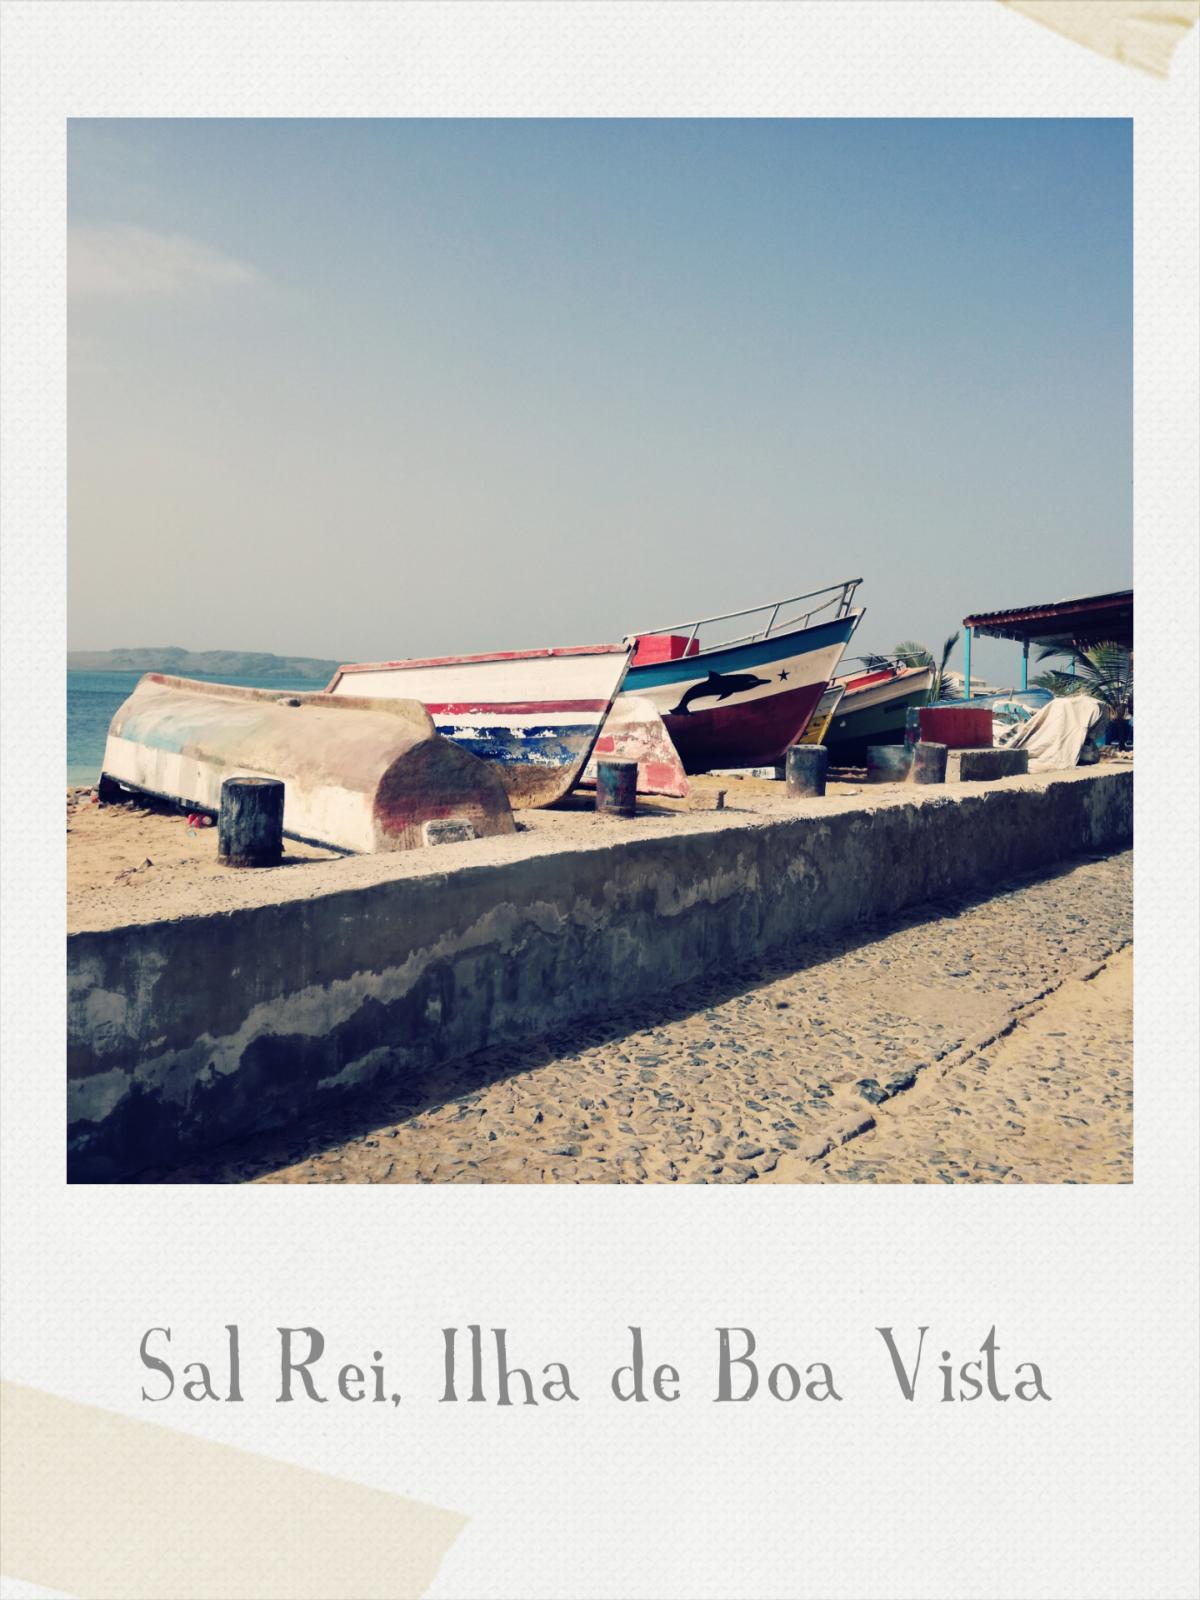 Sal Rei _ Ilha de Boa Vista, 7 febbraio